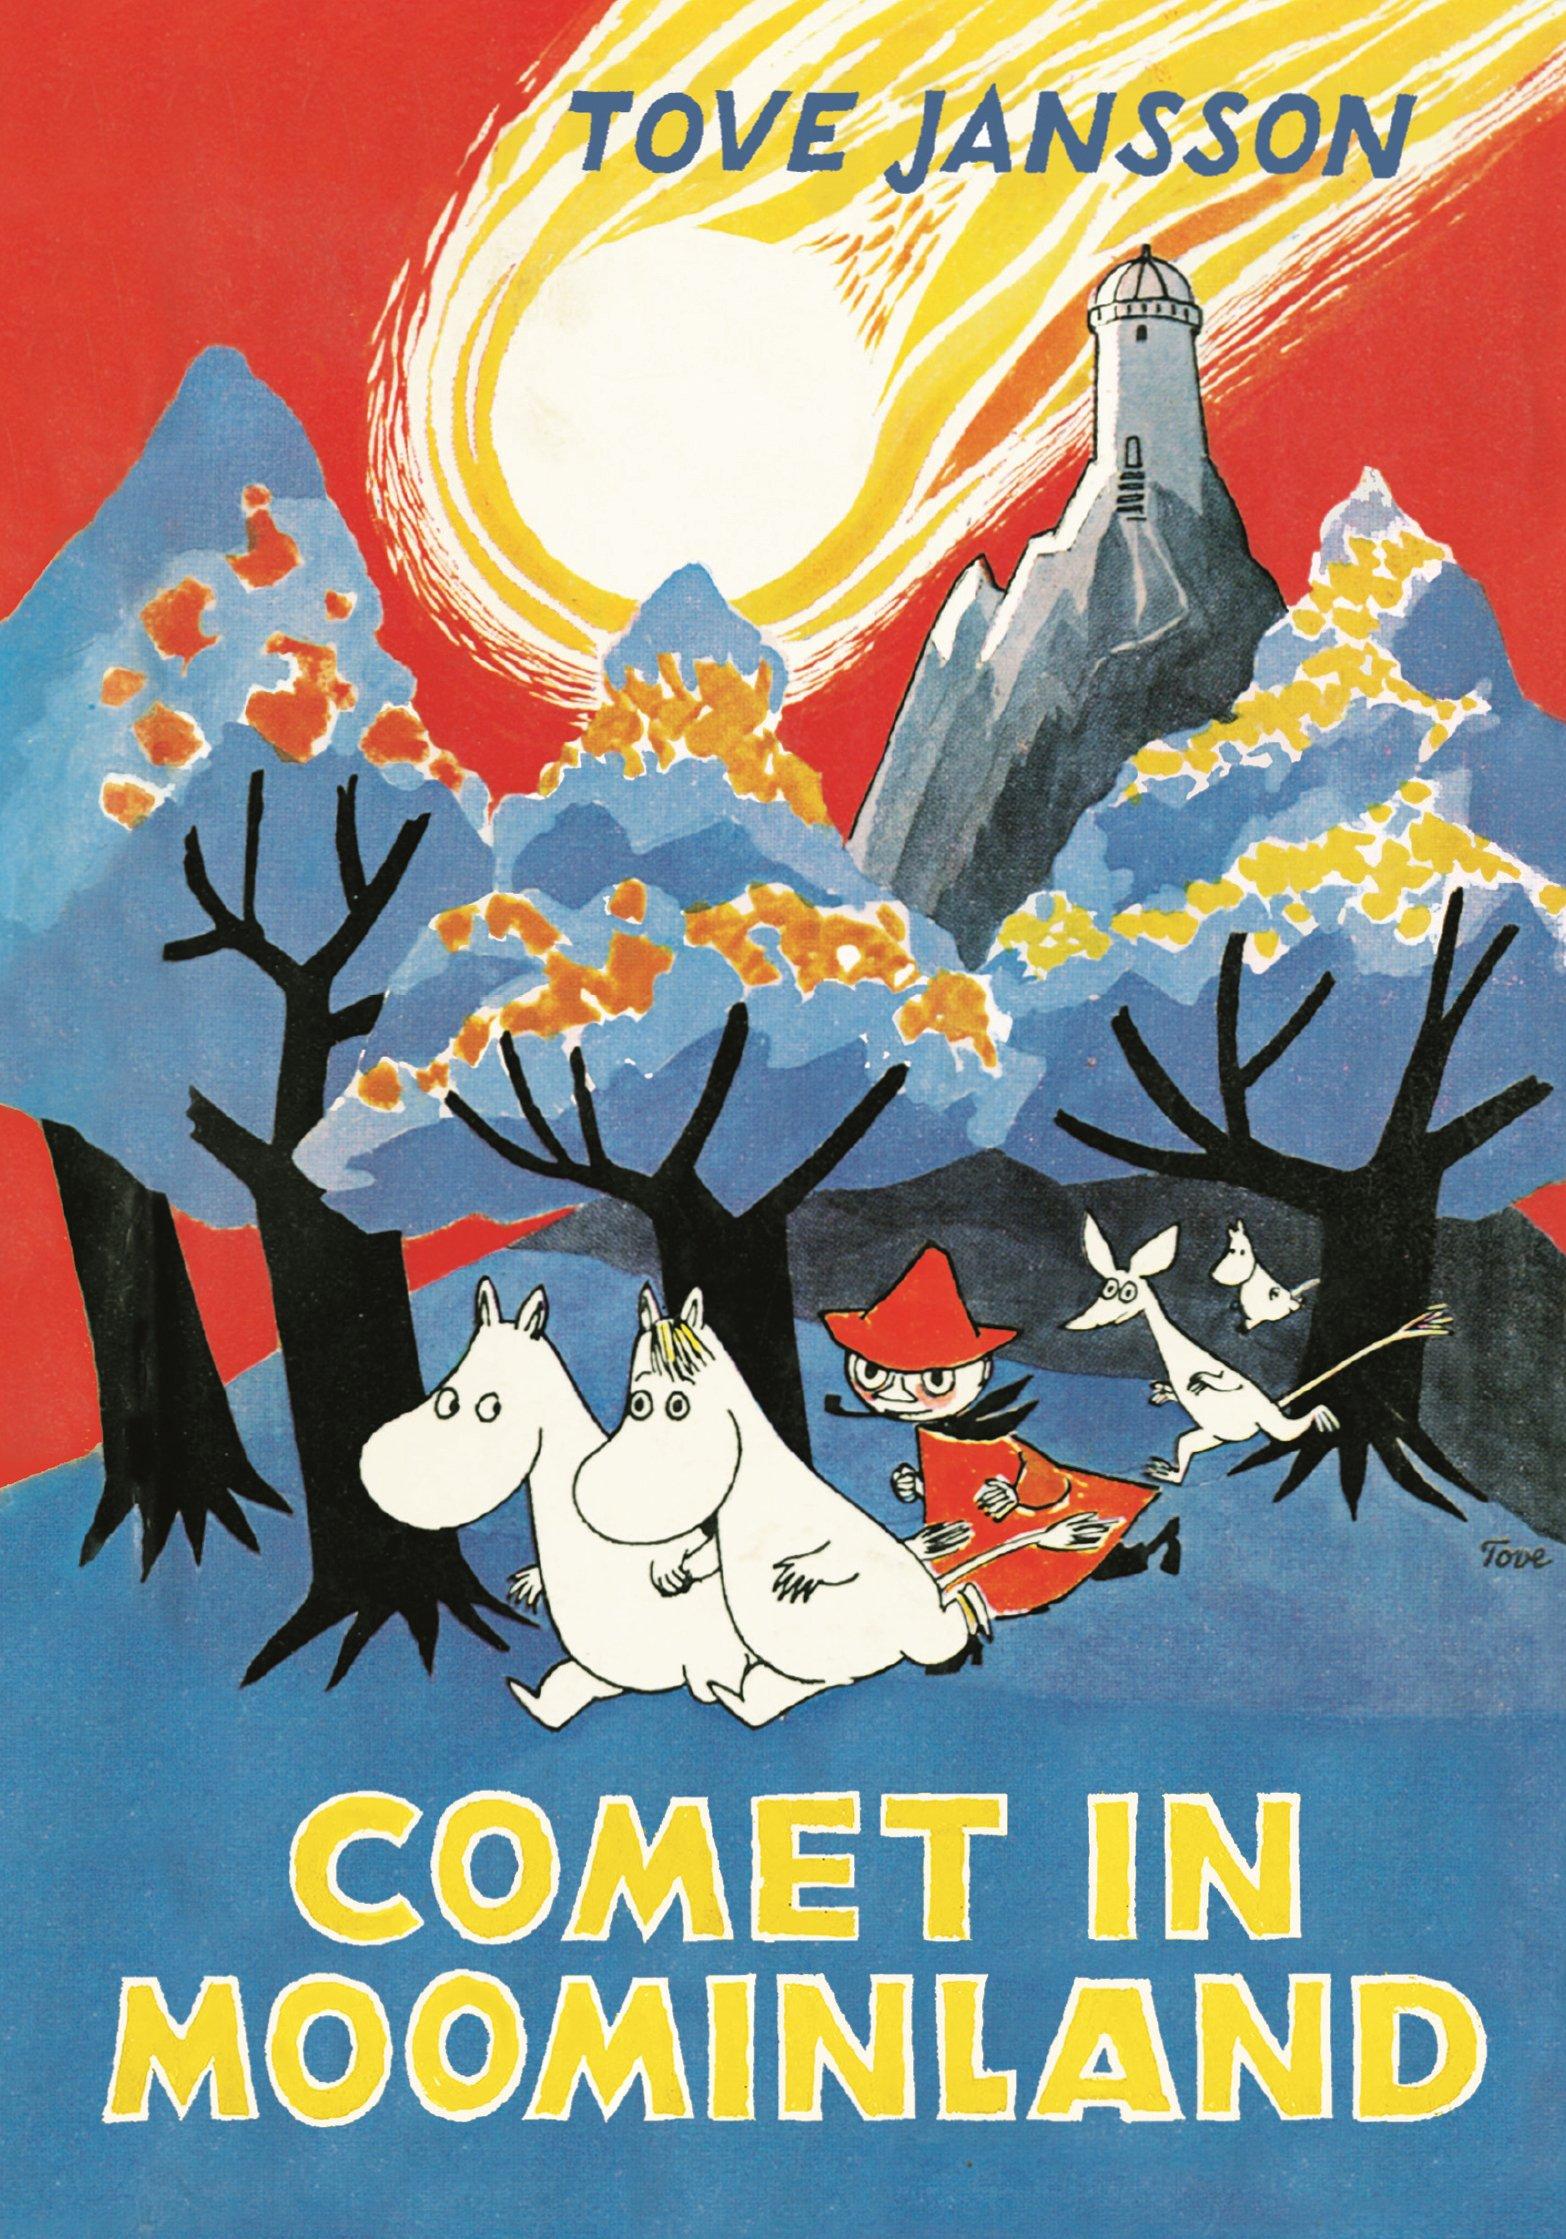 Tove Jansson Comet in Moominland Sort of Books.jpg